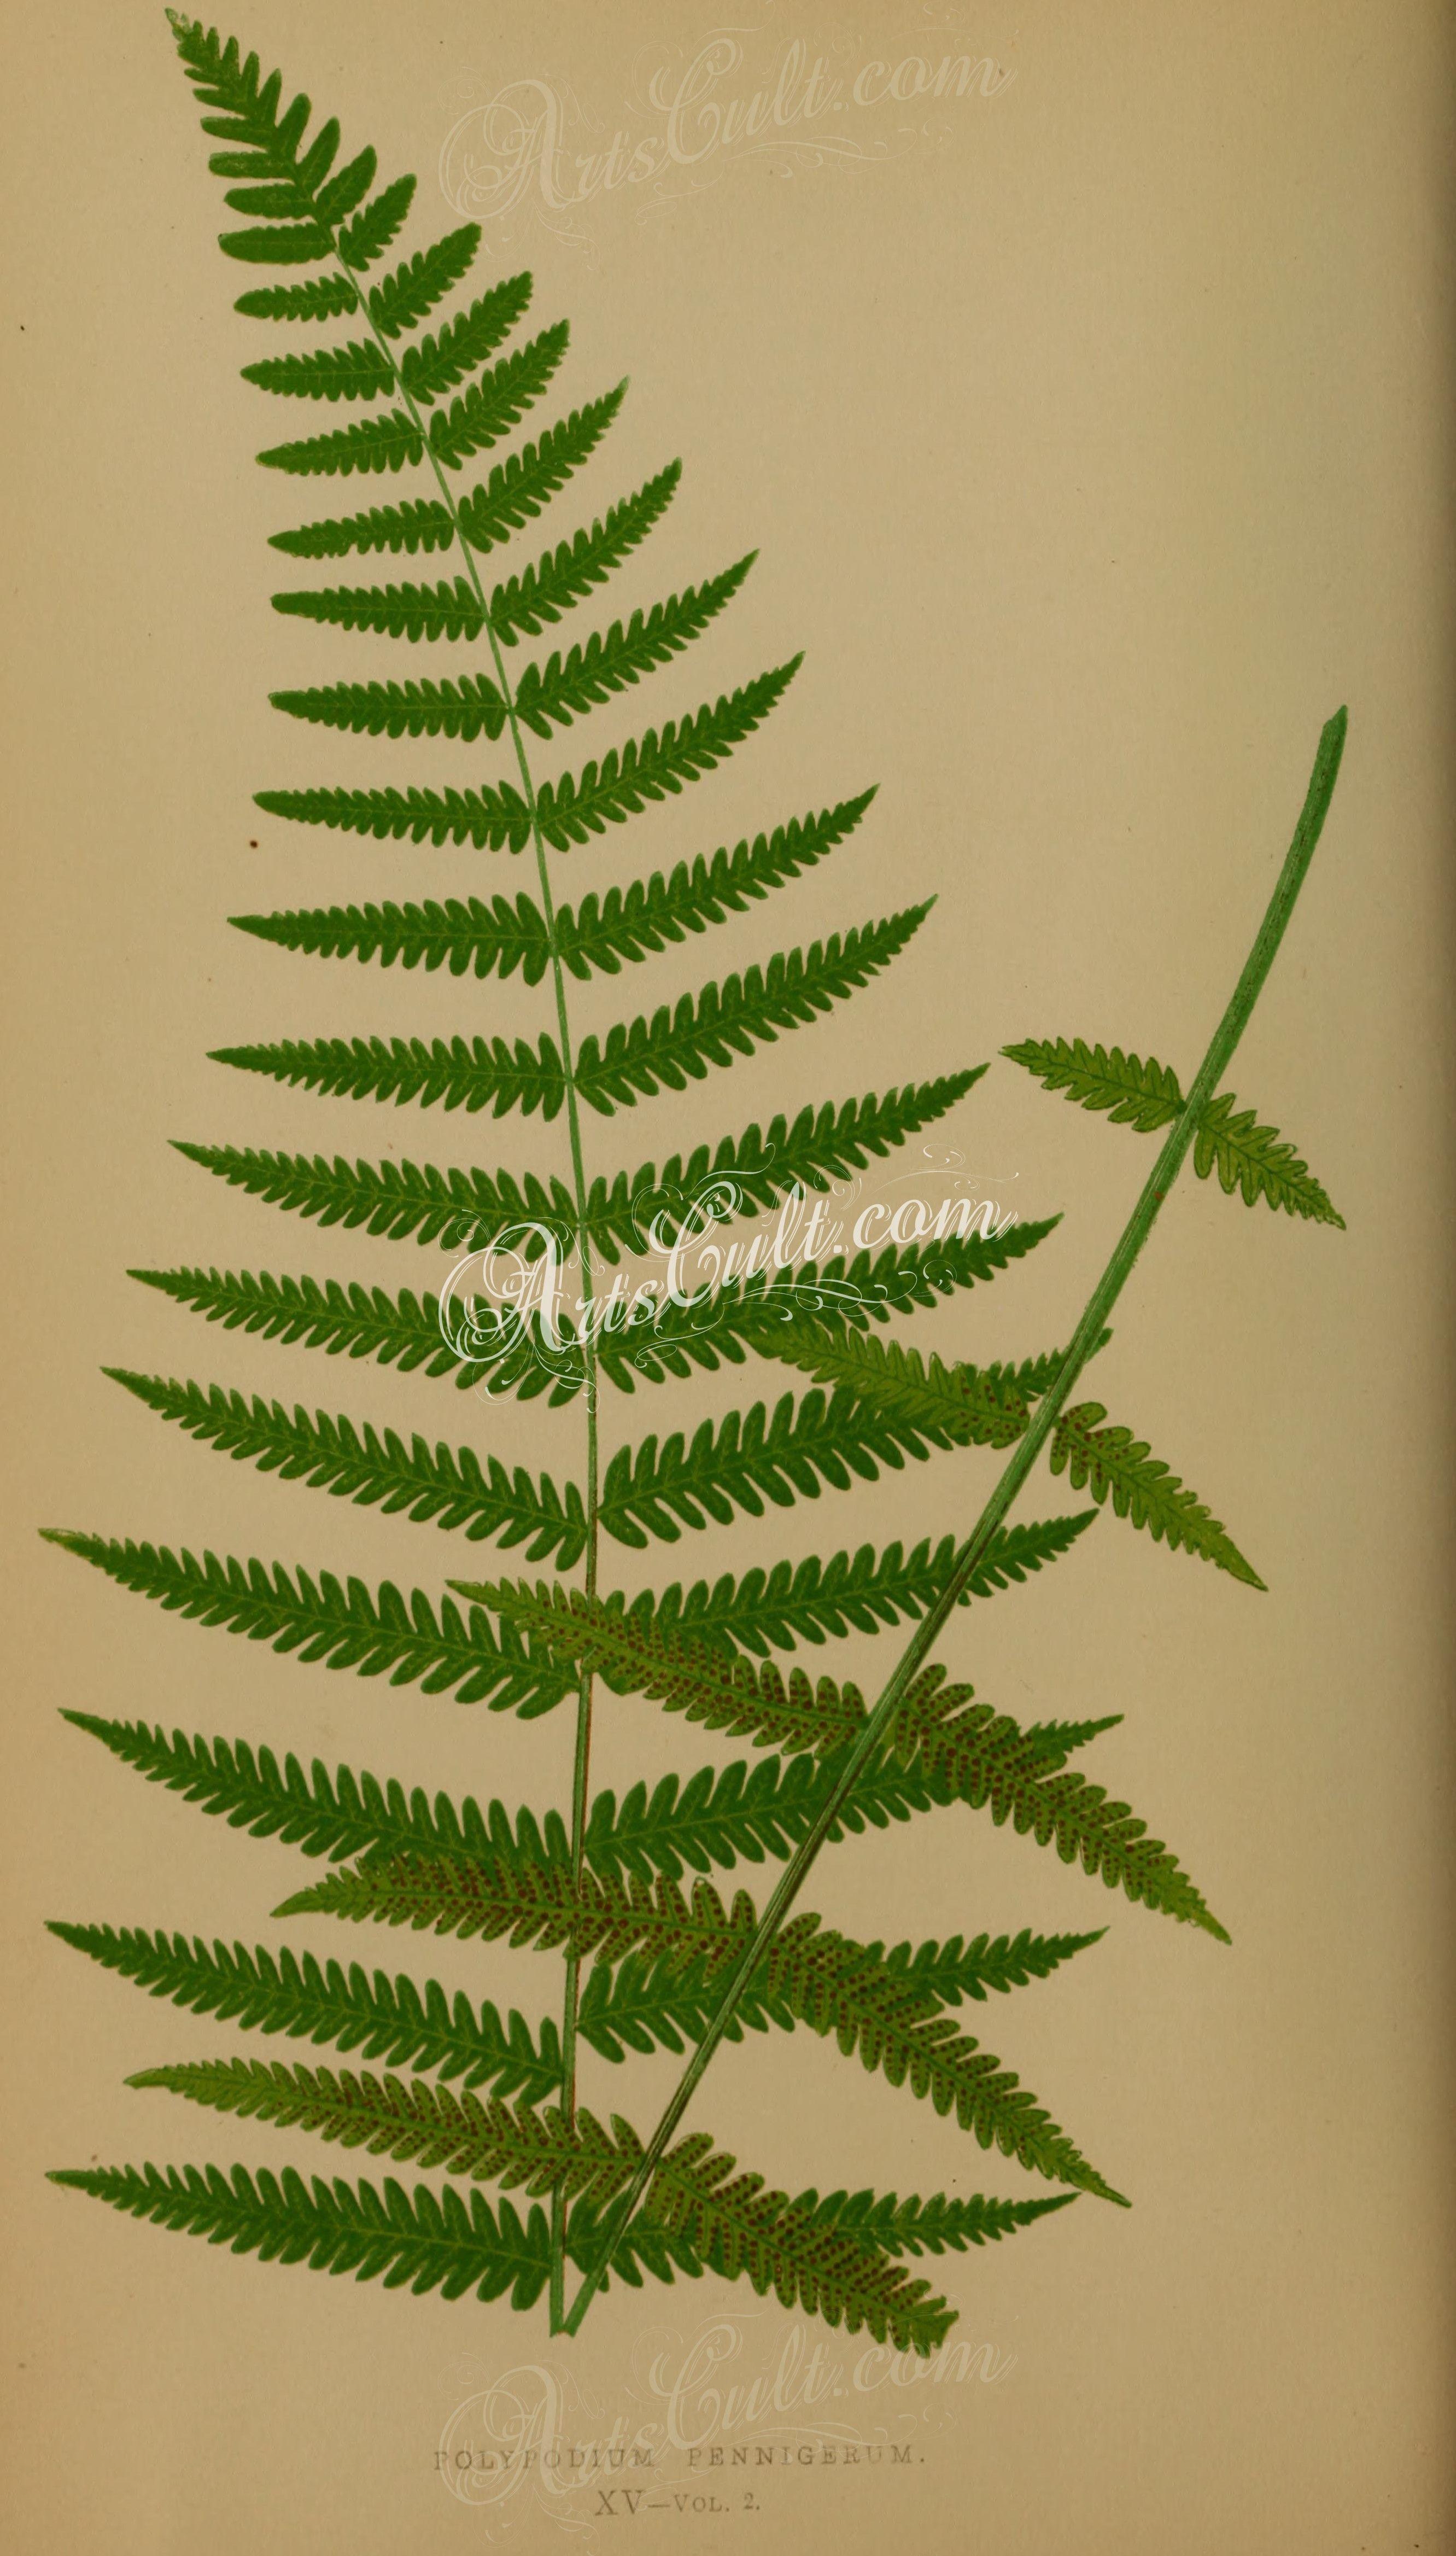 polypodium pennigerum (L) ... | ArtsCult.com | Pinterest